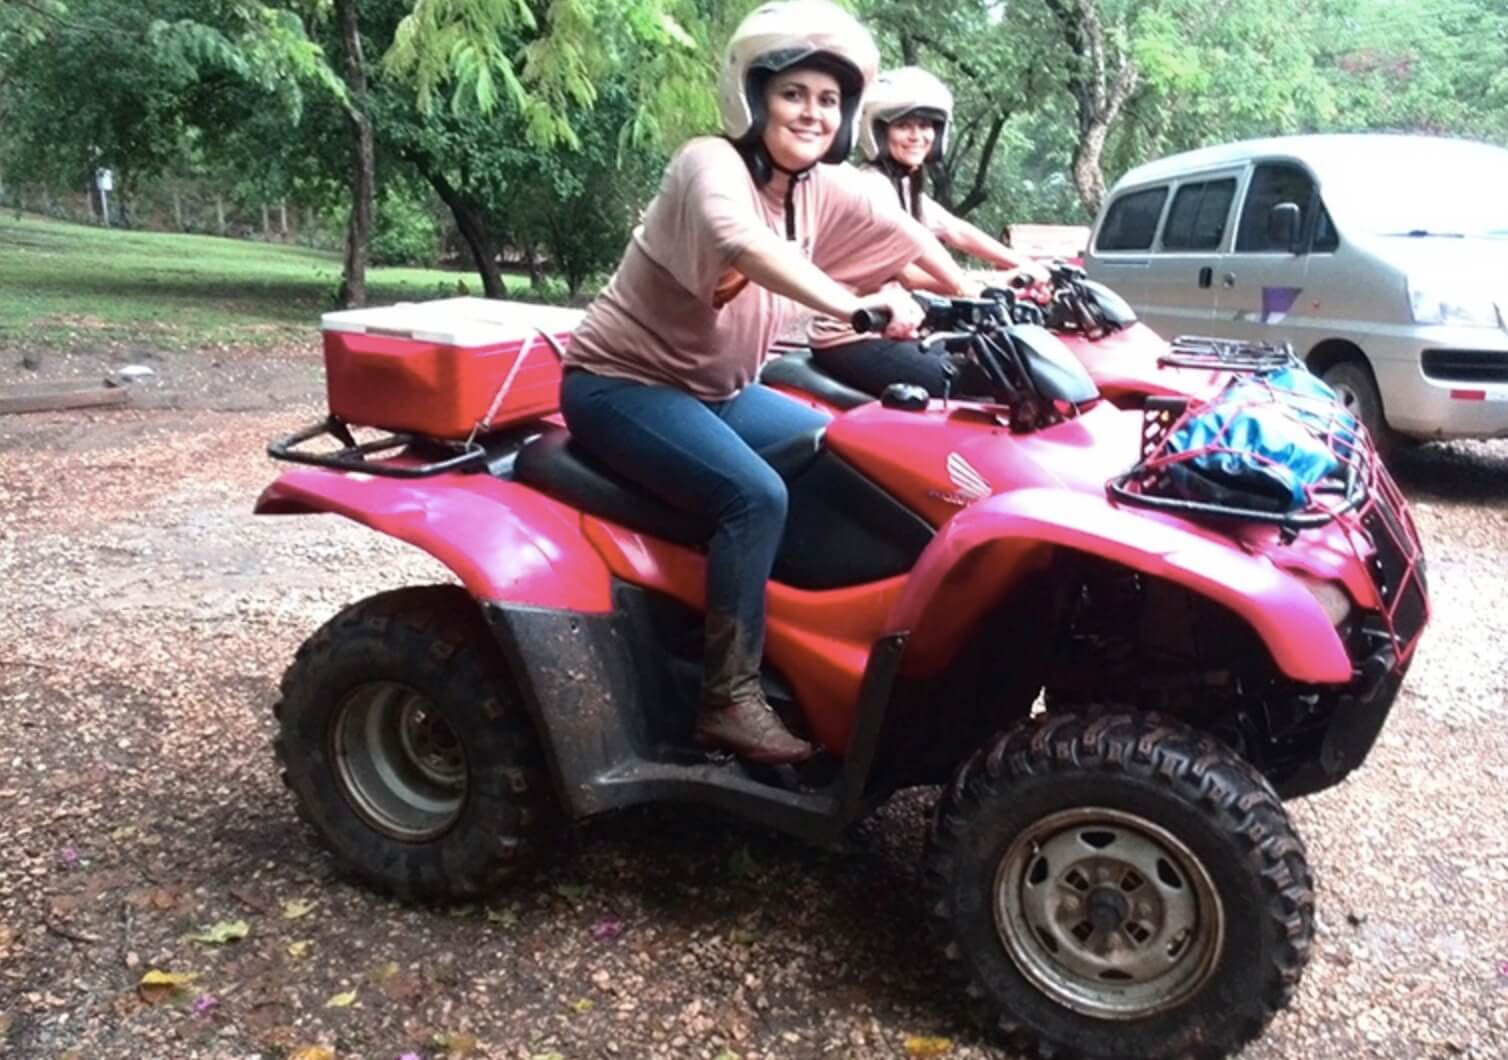 Tamarindo Guanacaste ATV adventure tour group smiling women